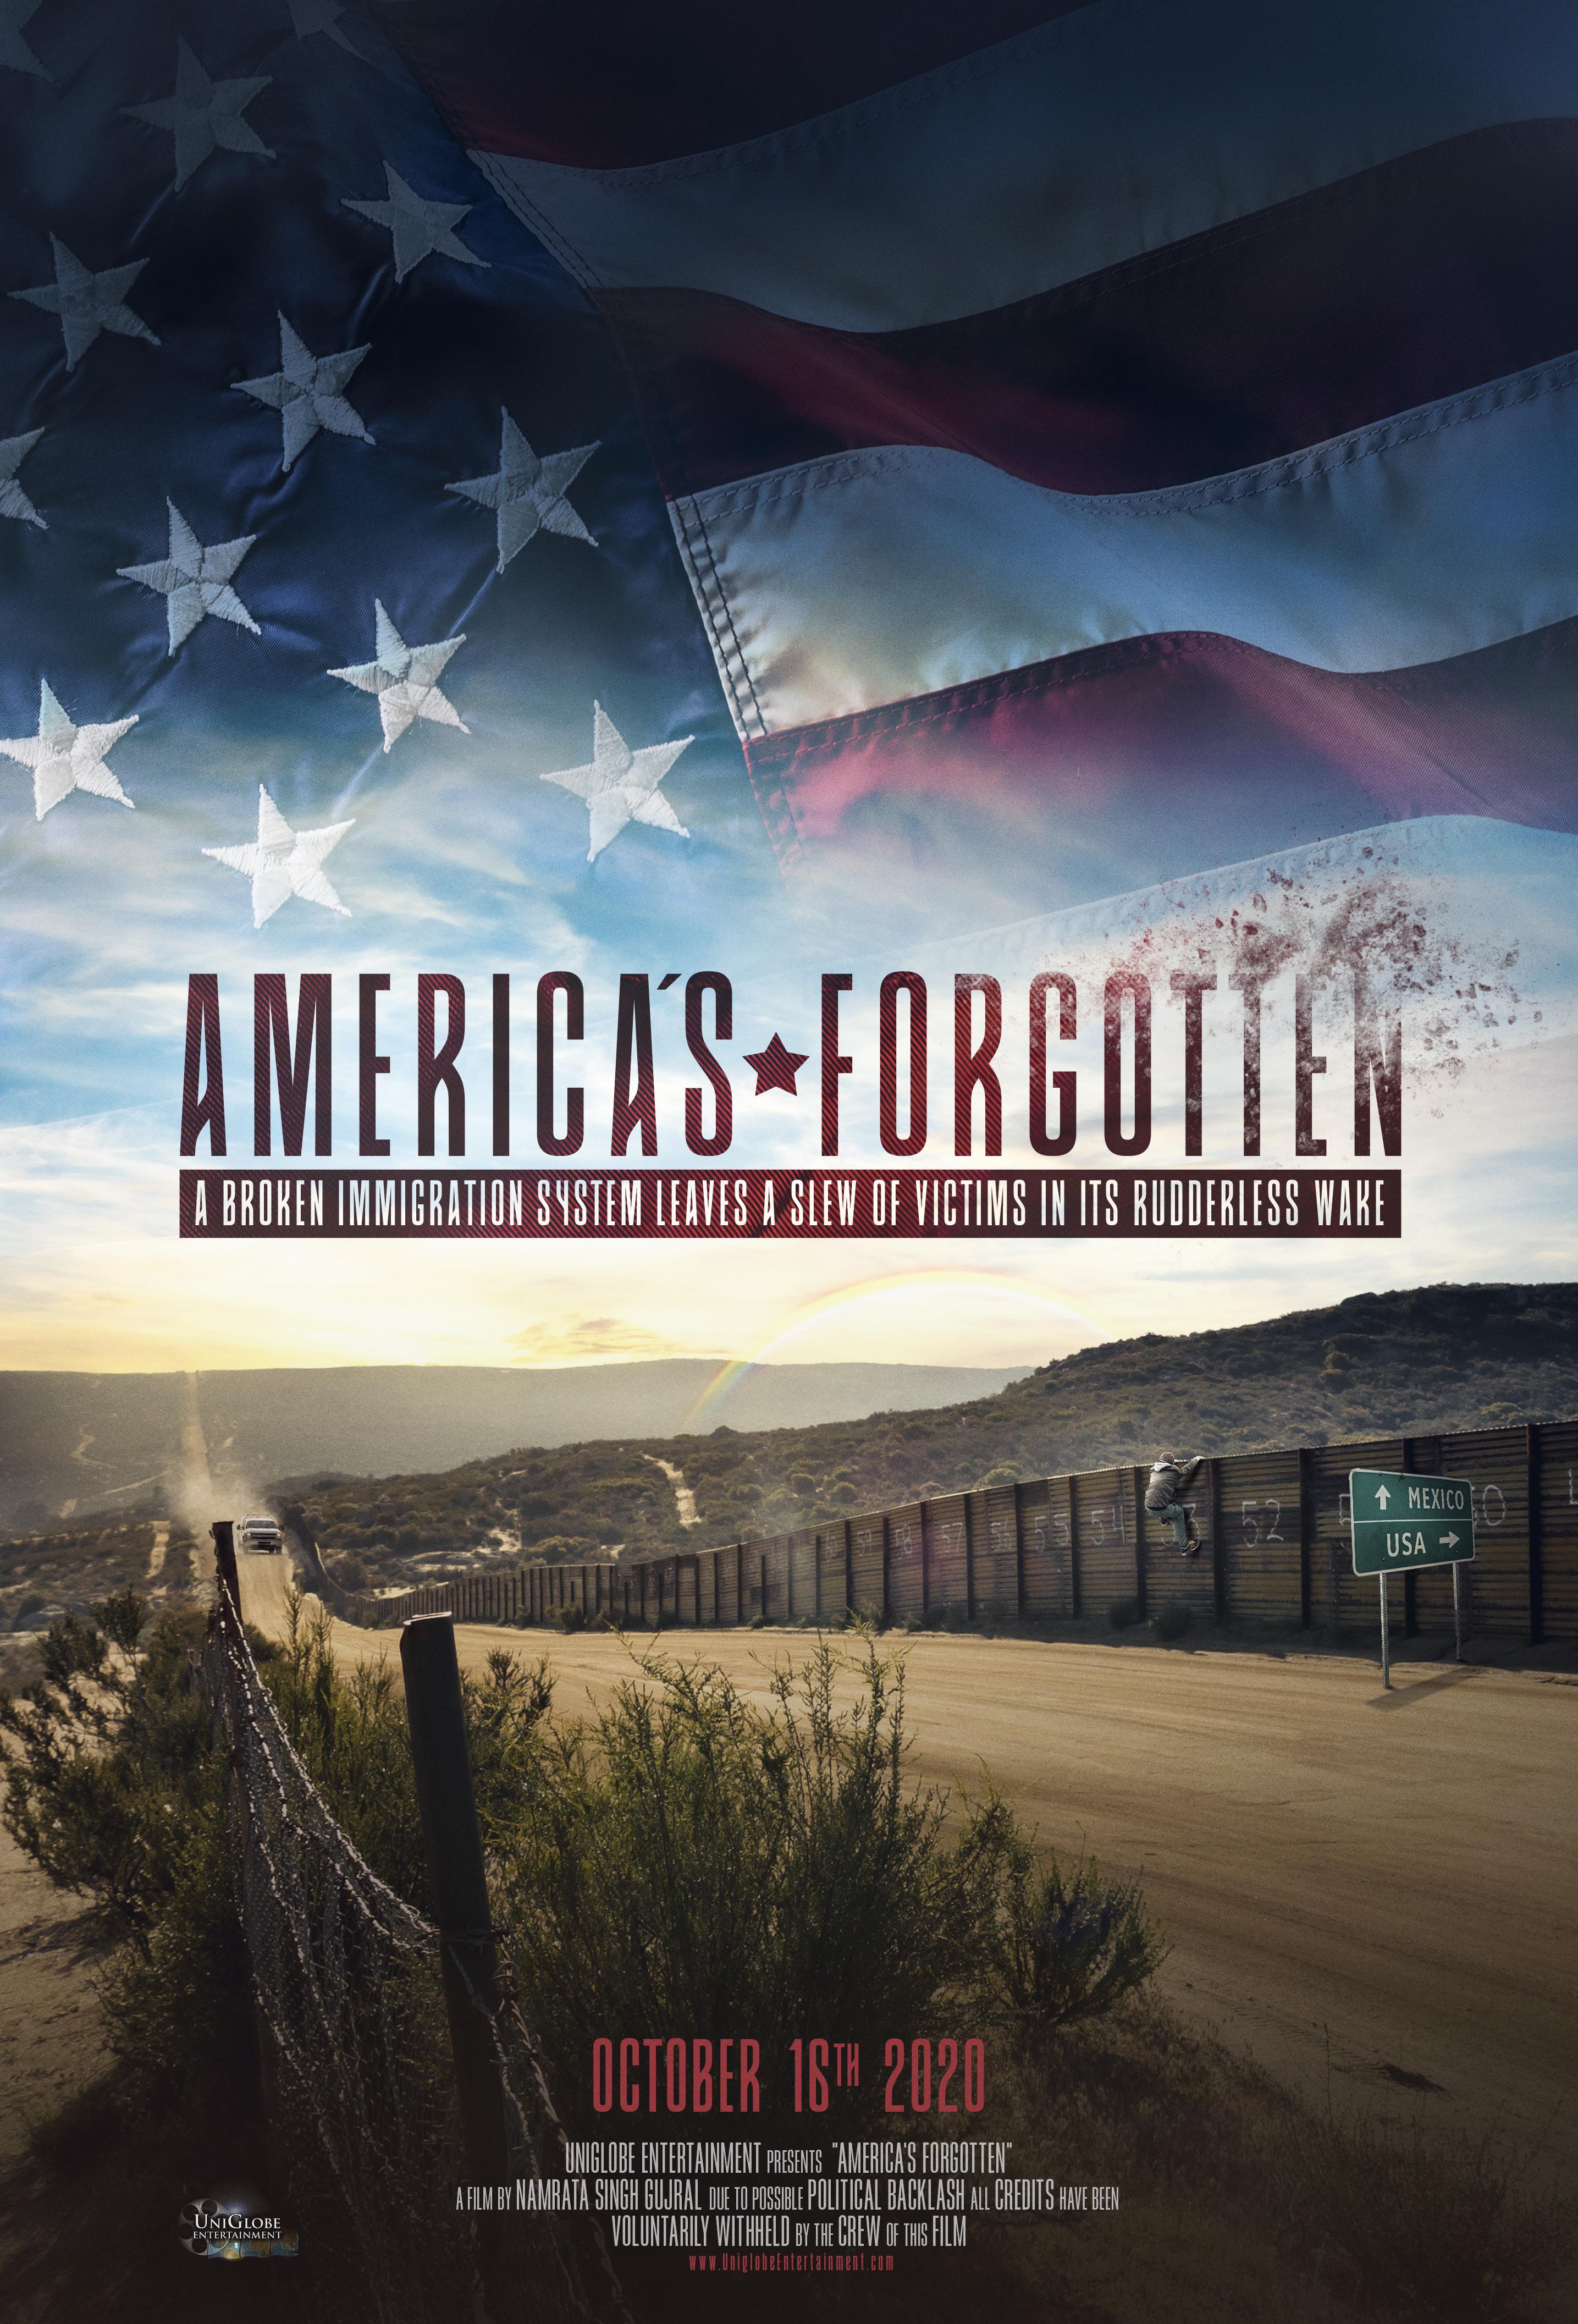 America's Forgotten